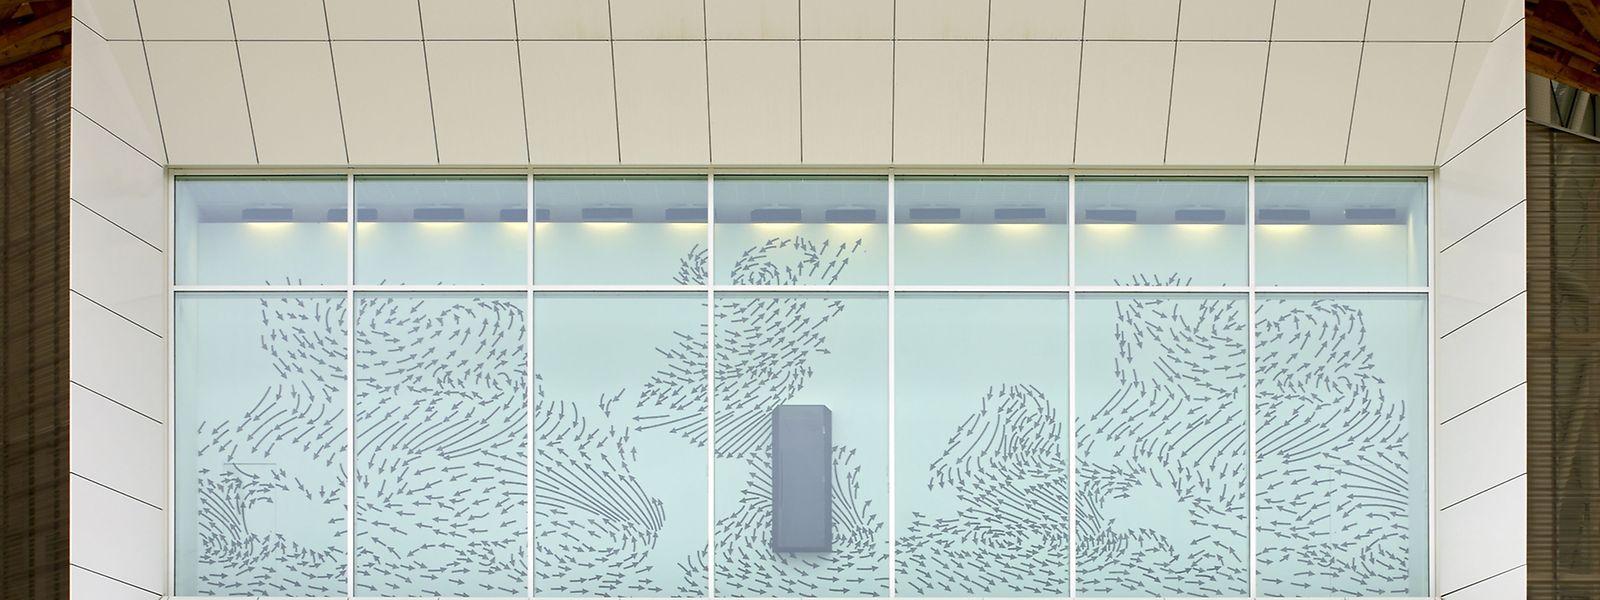 Le centre Pompidou-Metz ouvre sa Grande Nef à Yves Klein.